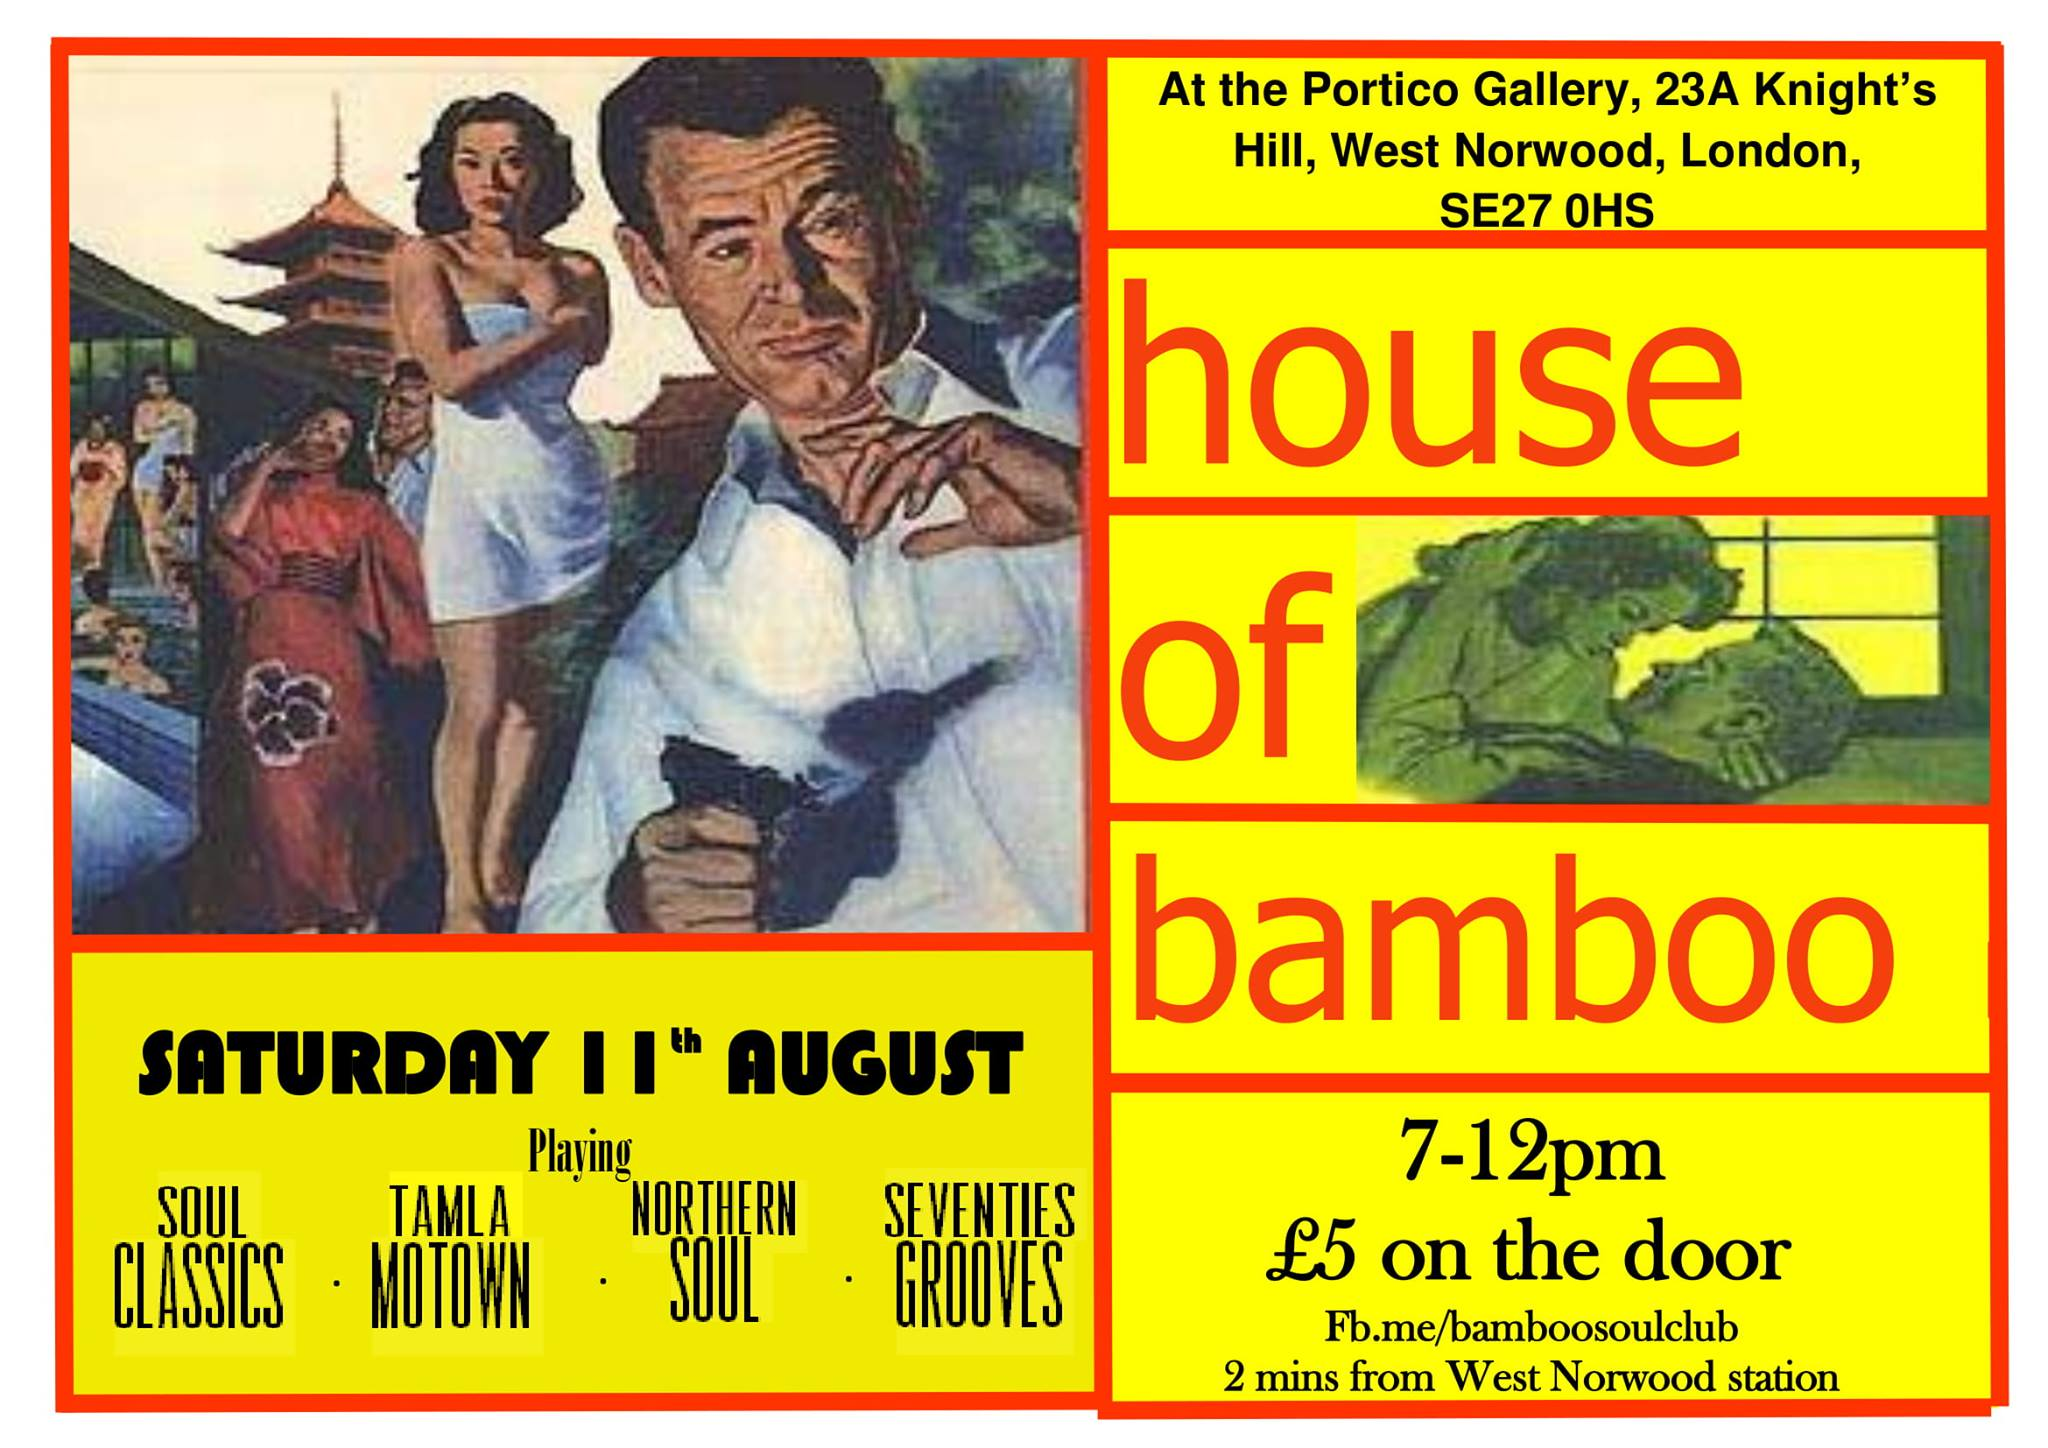 House of Bamboo Soul Club, London SE27 OHS, DJs Adam Jenkins, Tom Ambrose, Dave Diston & Neil Stroud. Northern Soul, 60s Soul, Tamla Motown, Latin Soul & 60s R&B. 18/08/17